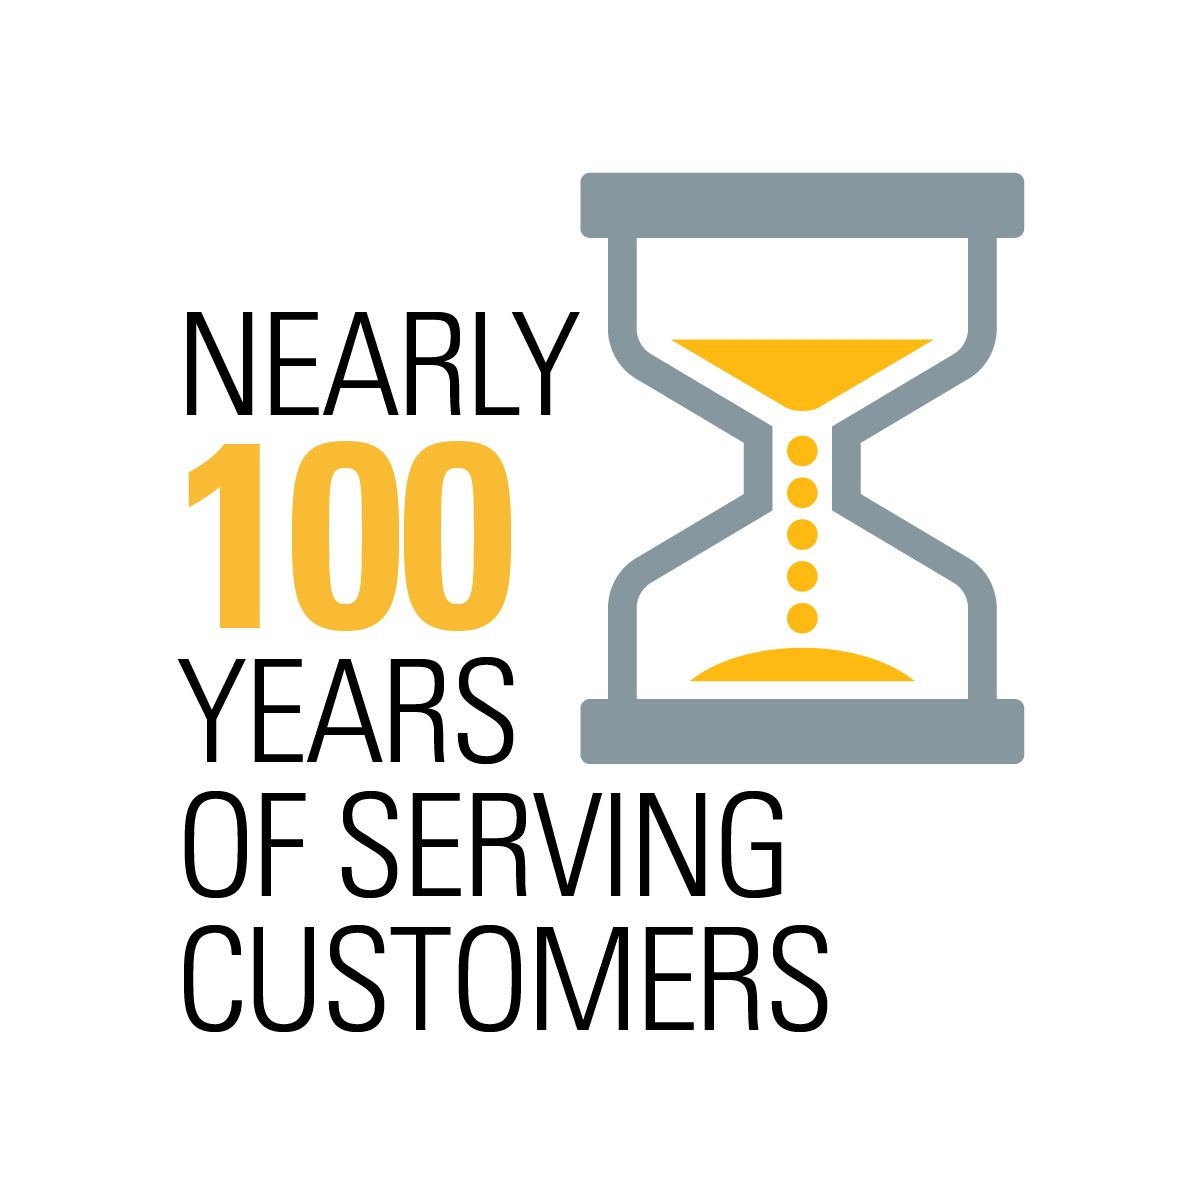 Nearly 100 years of customer service